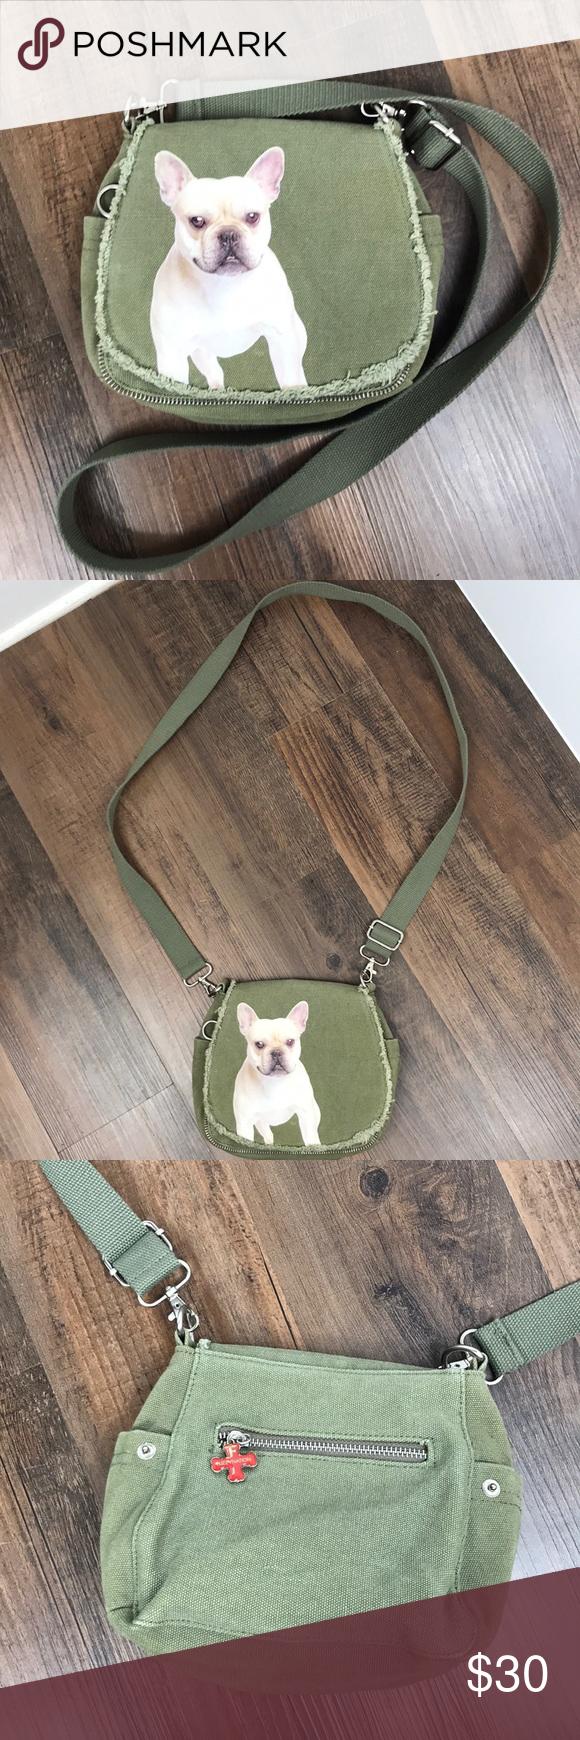 Fuzzy Nation French Bulldog Crossbody Bag Crossbody bag